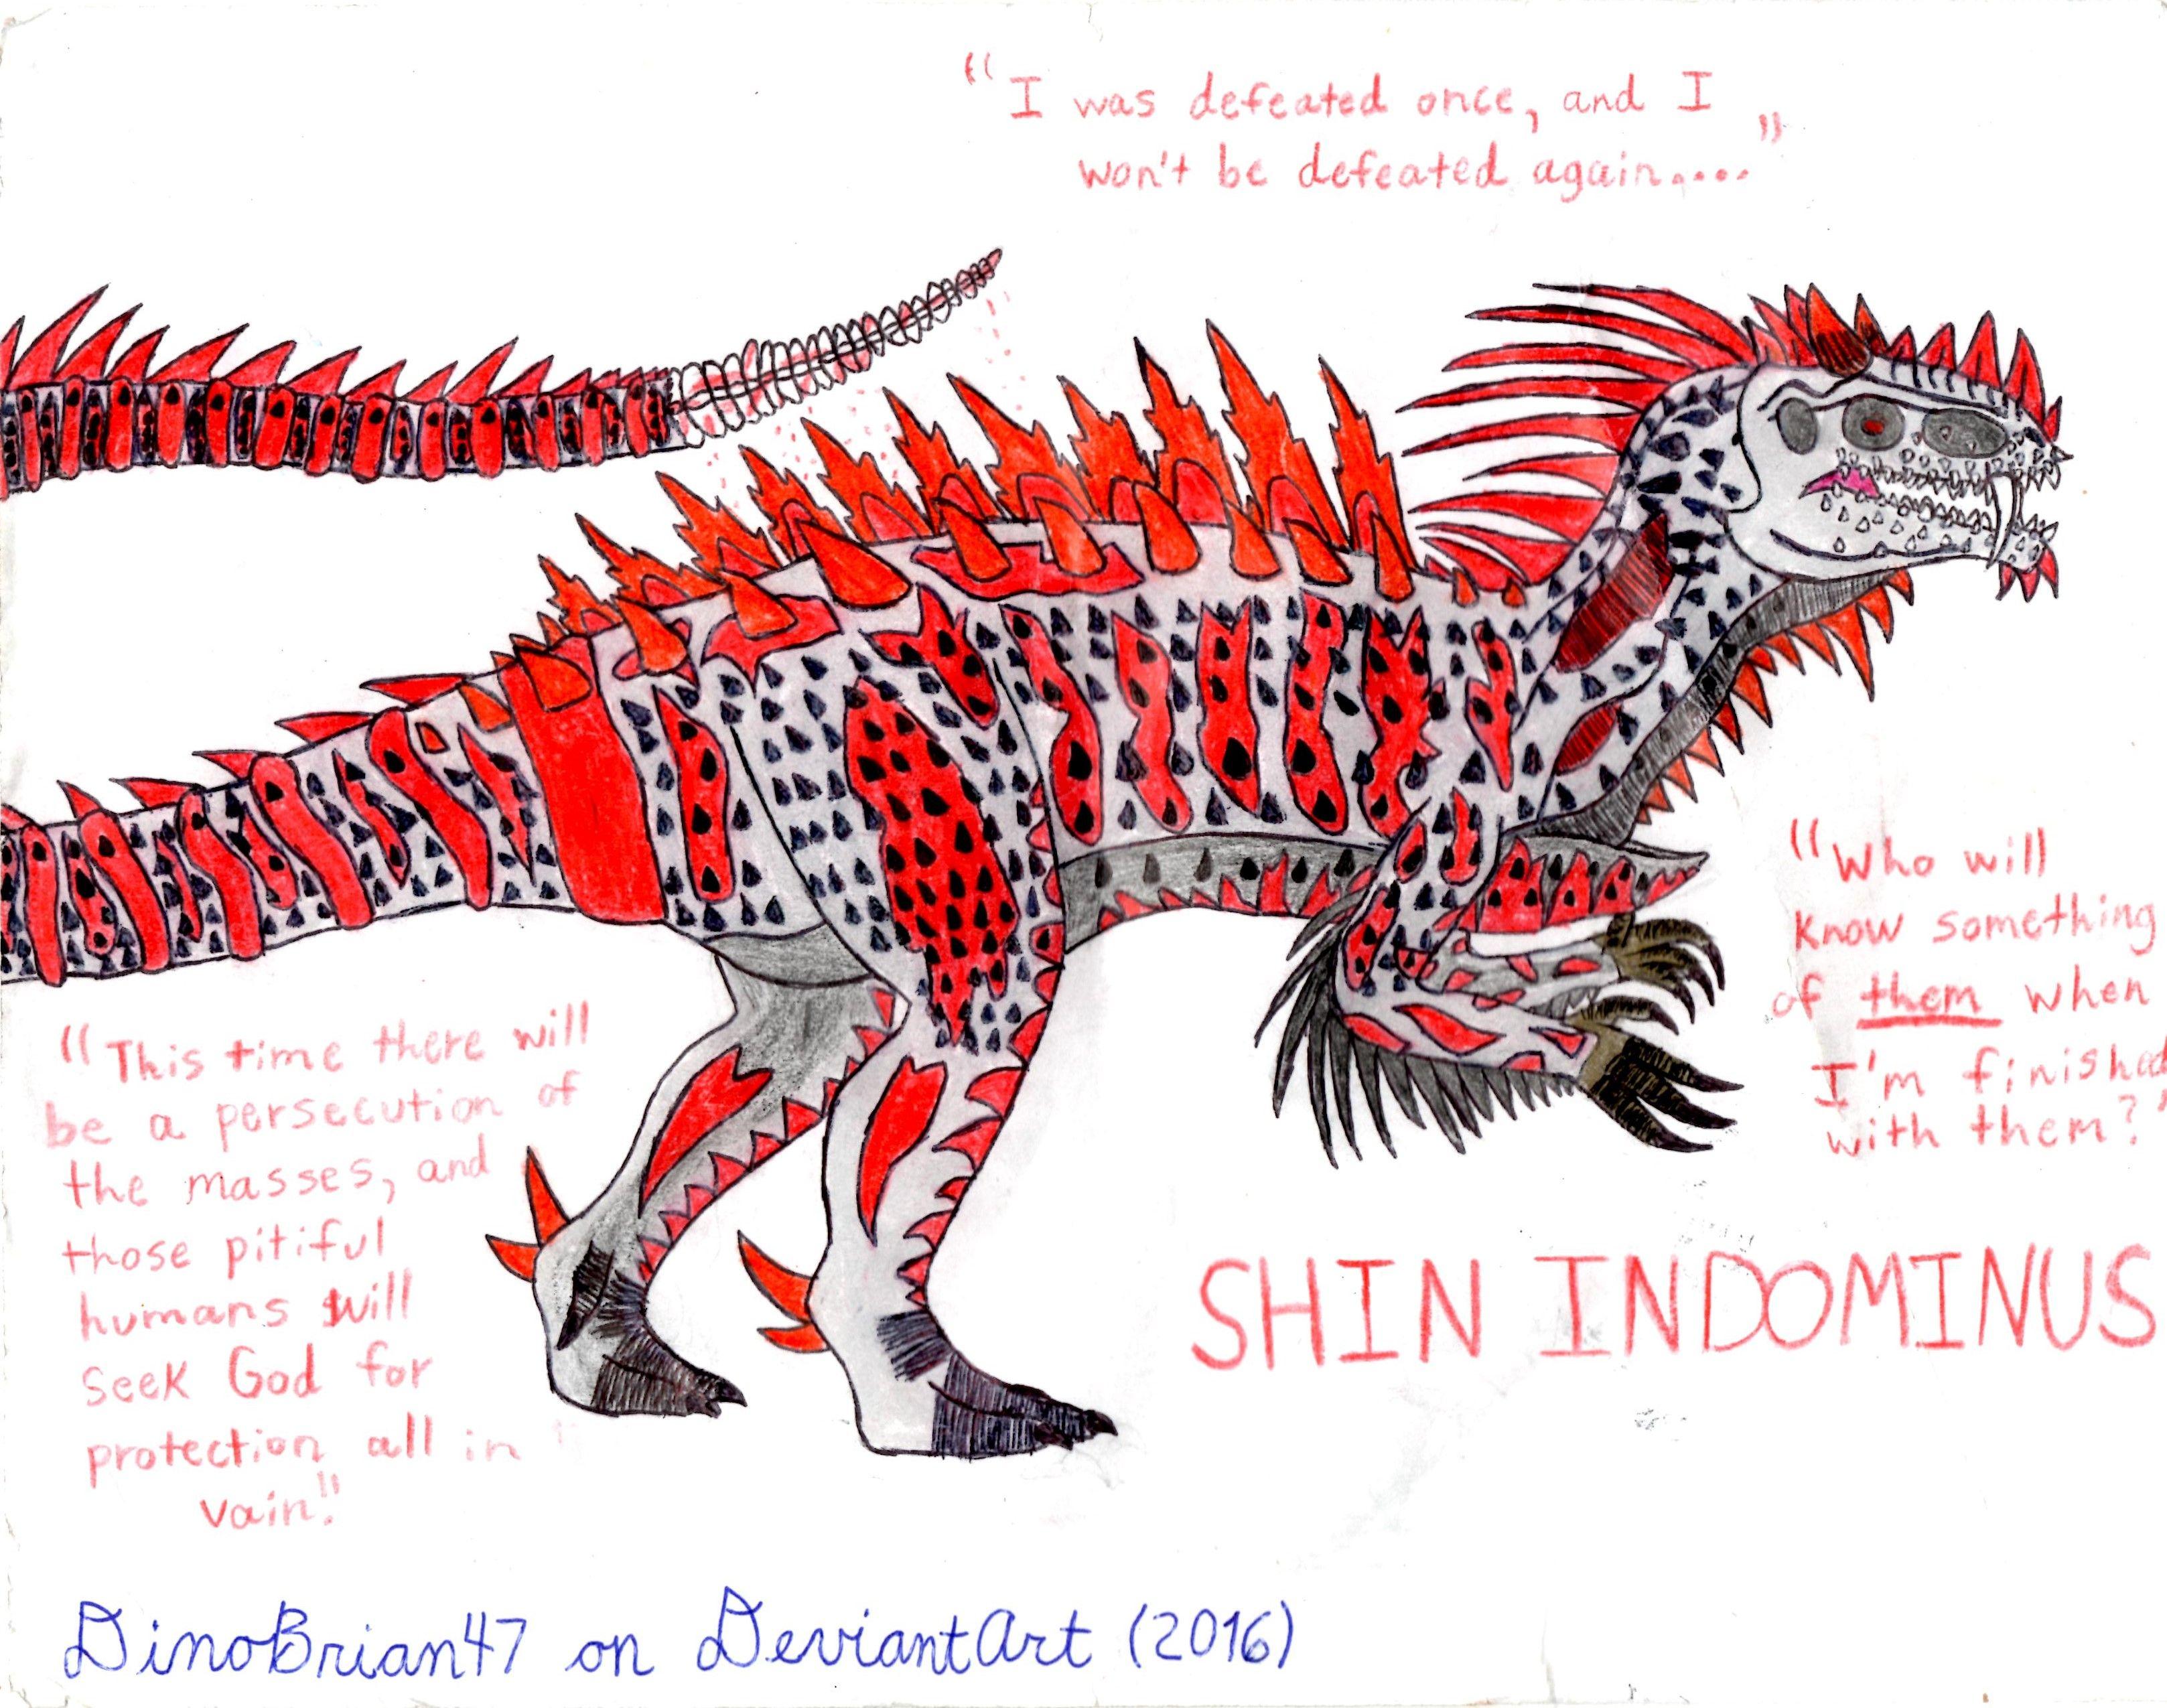 Indominus Rex Resurgence (Halloween Special) by